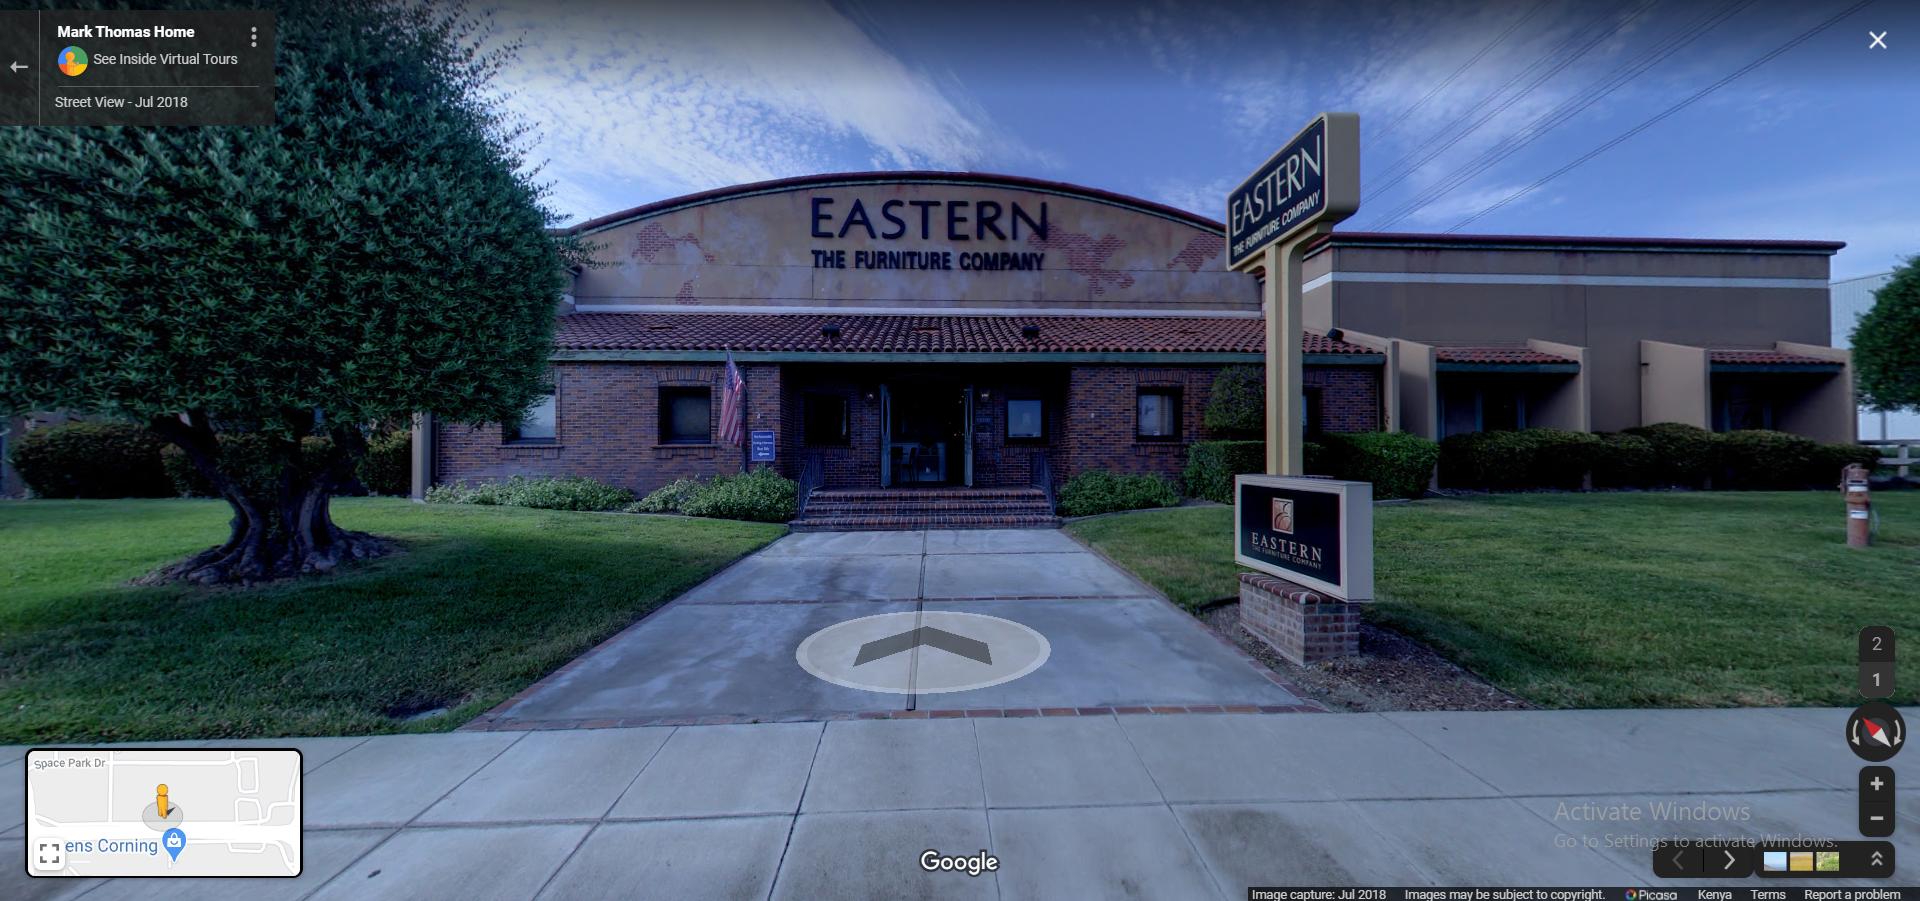 Eastern, The Furniture Company - Santa Clara